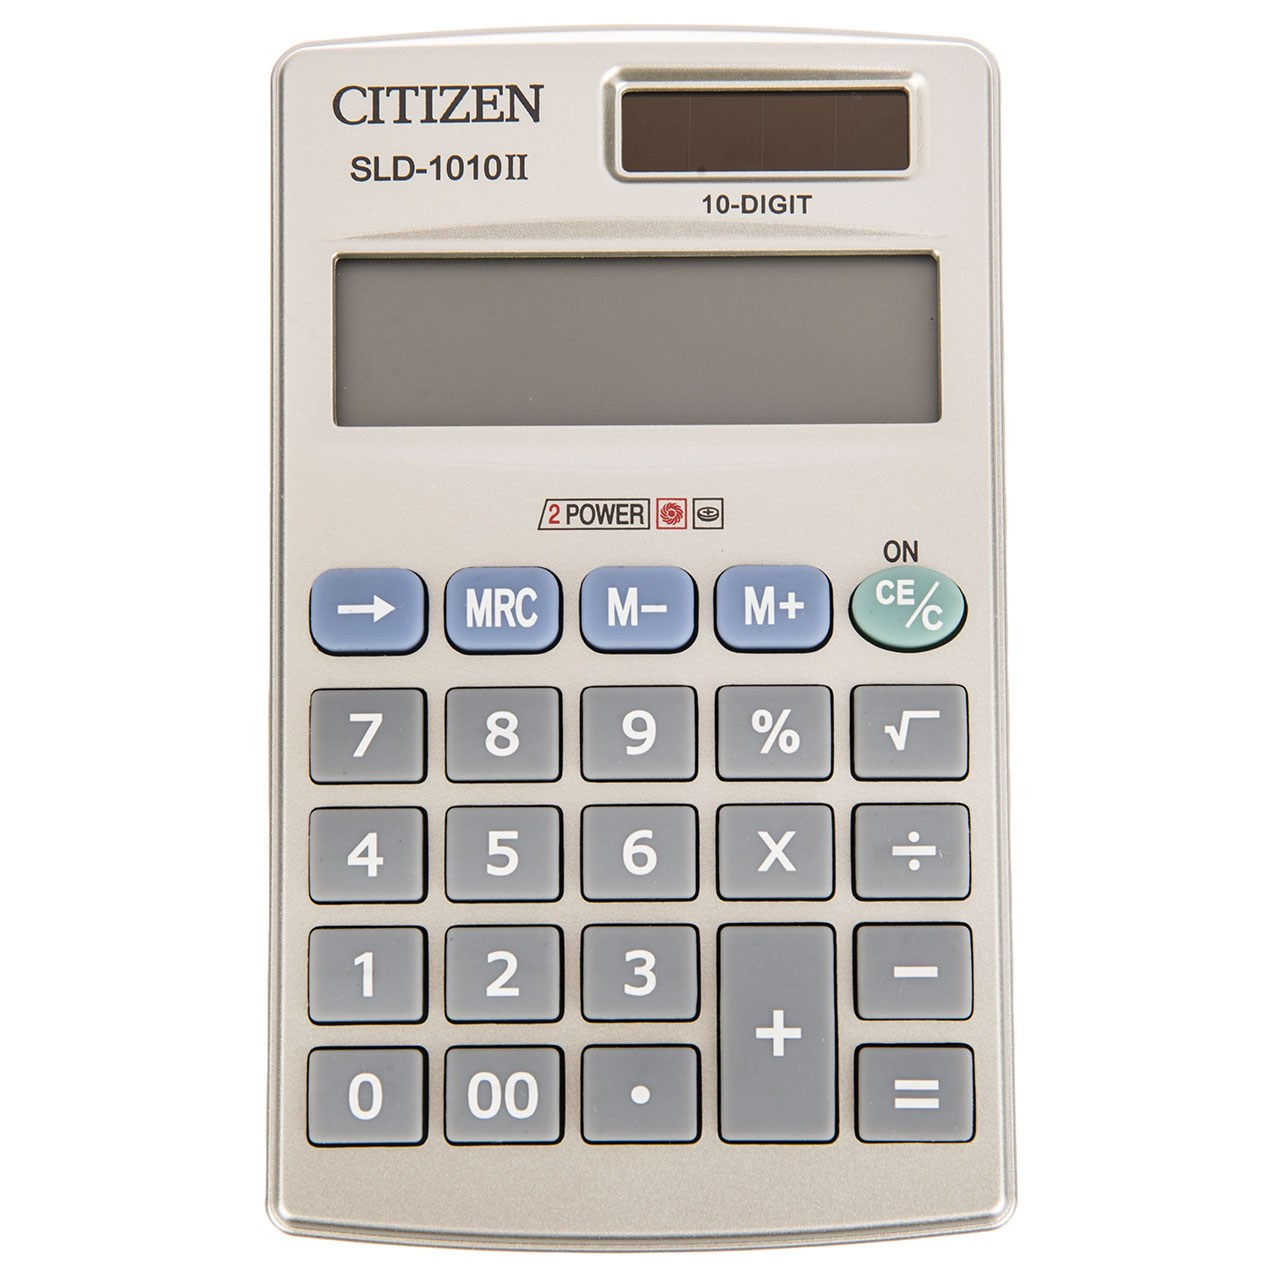 قیمت                      ماشین حساب سیتیزن مدل SLD-1010II